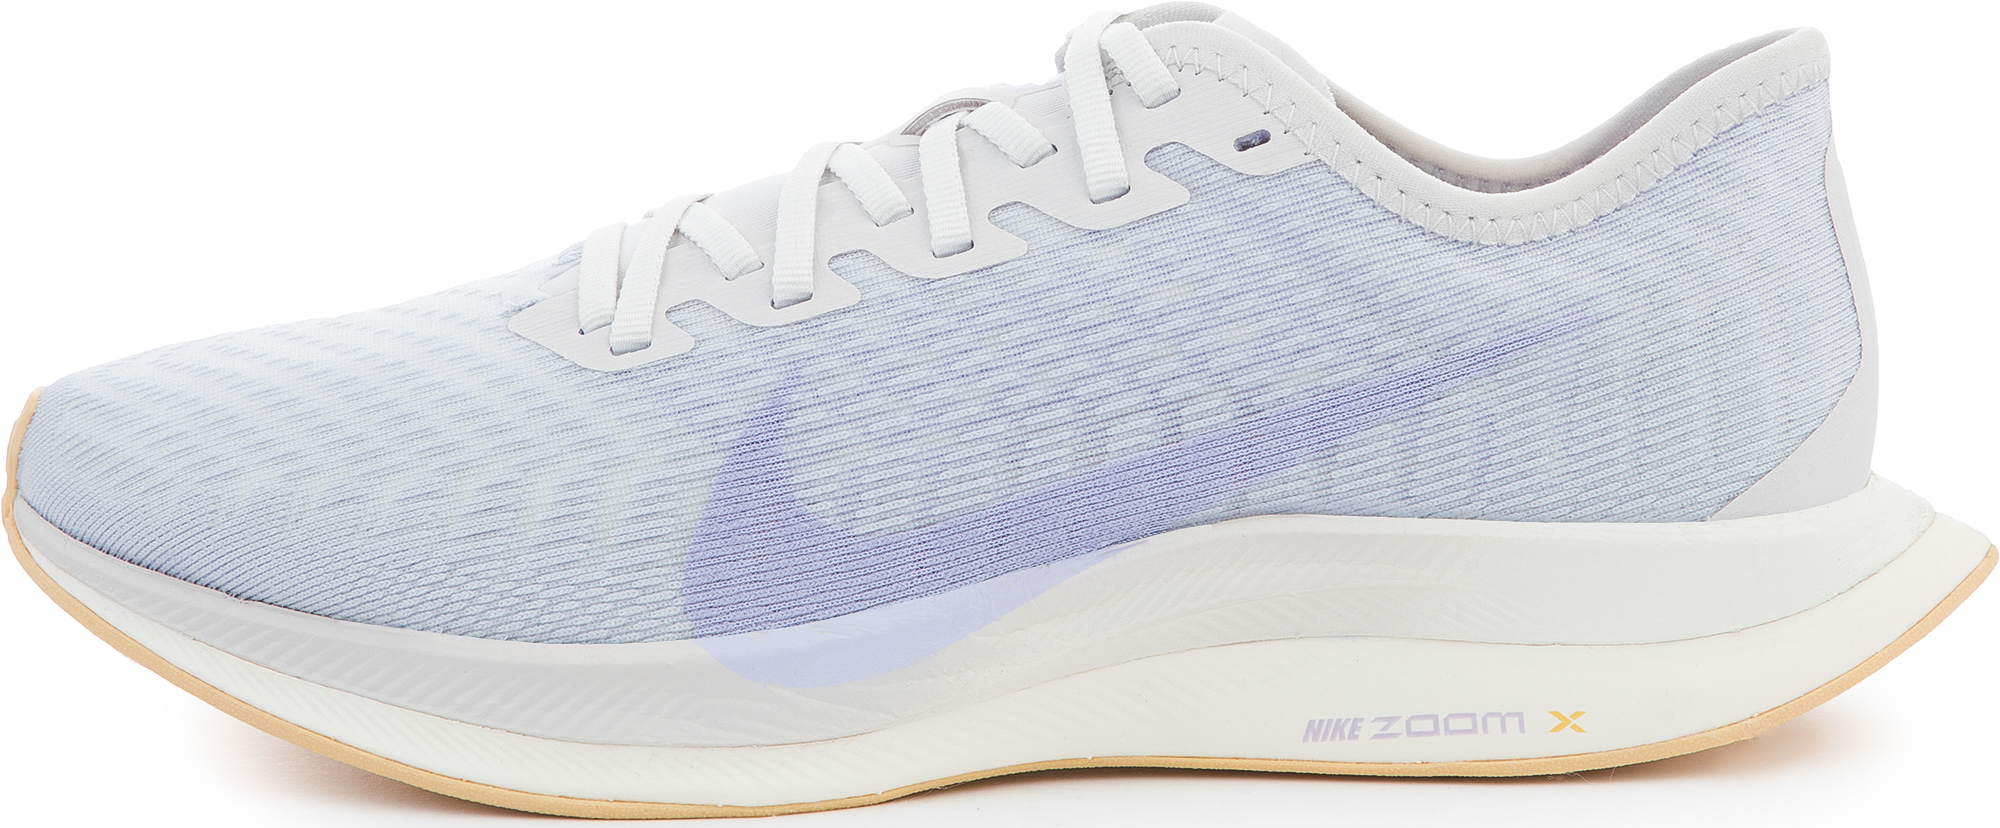 Nike Кроссовки женские Nike Zoom Pegasus Turbo, размер 35,5 цена